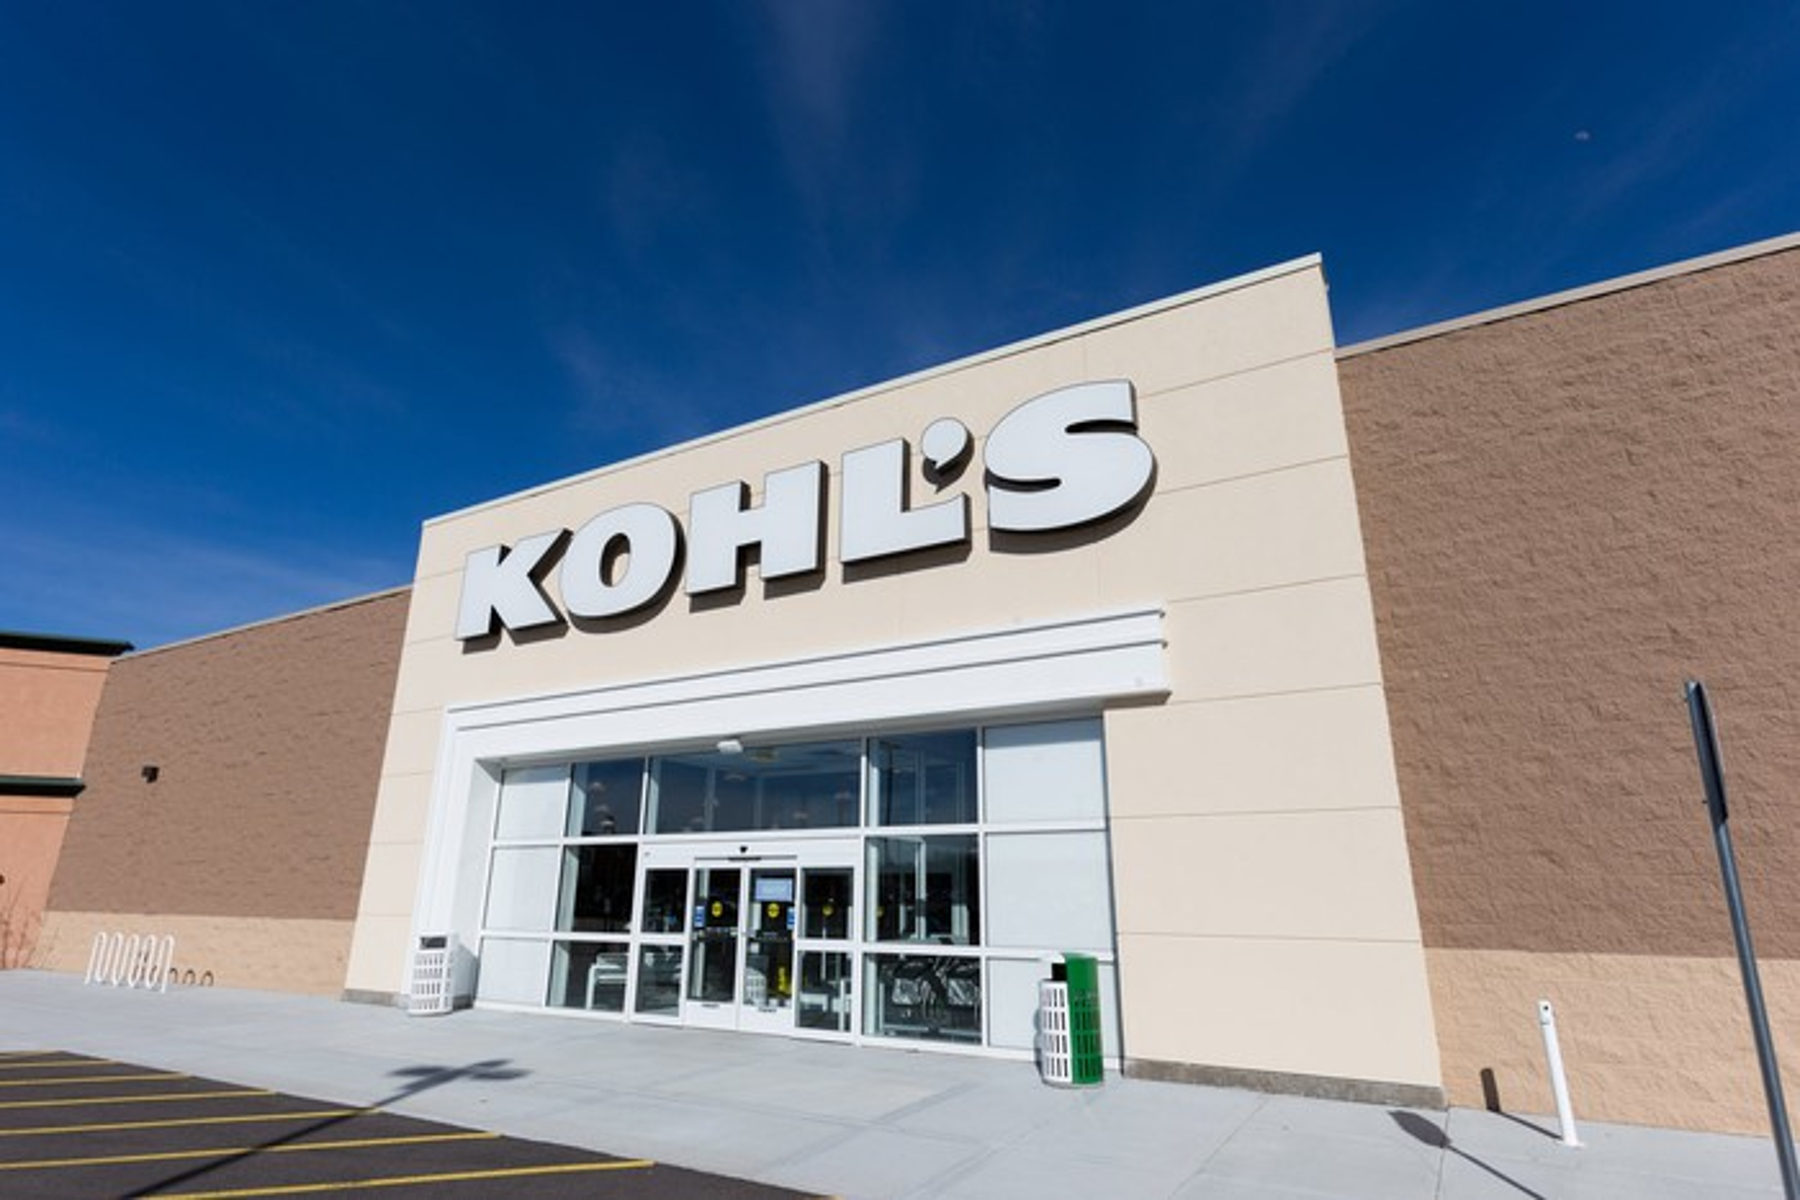 A Kohl's storefront.